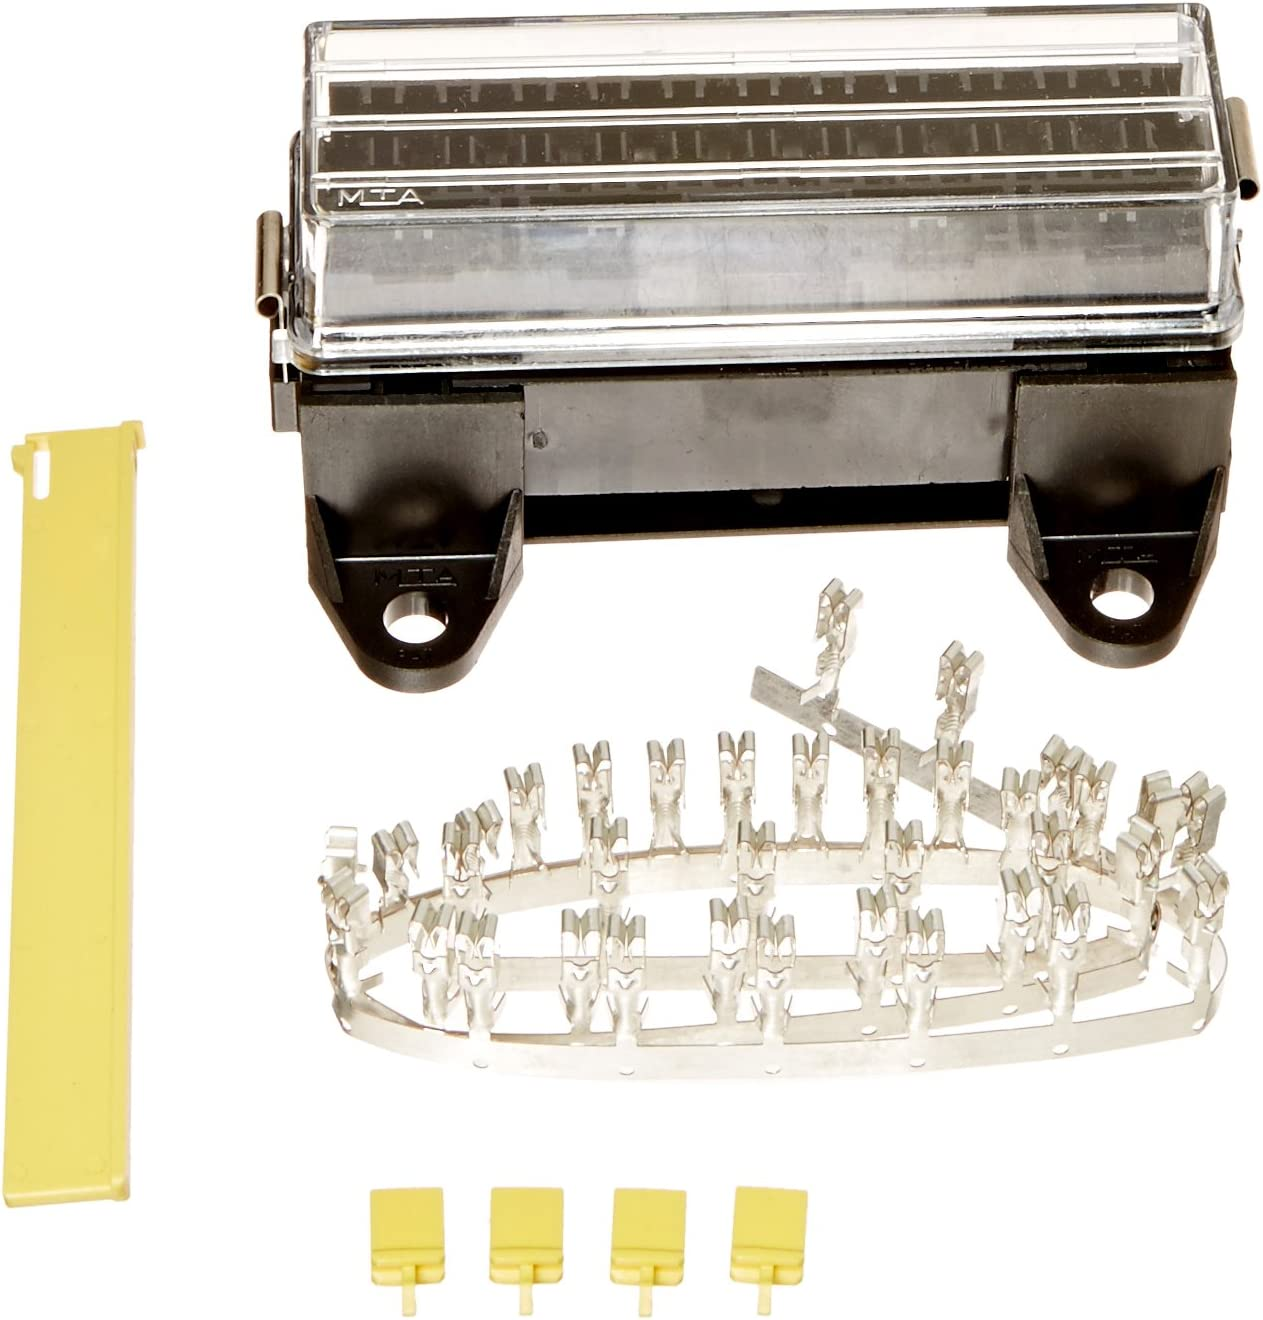 Amazon.com: HELLA H84960051 16-Way Fuse Box Kit: Automotive